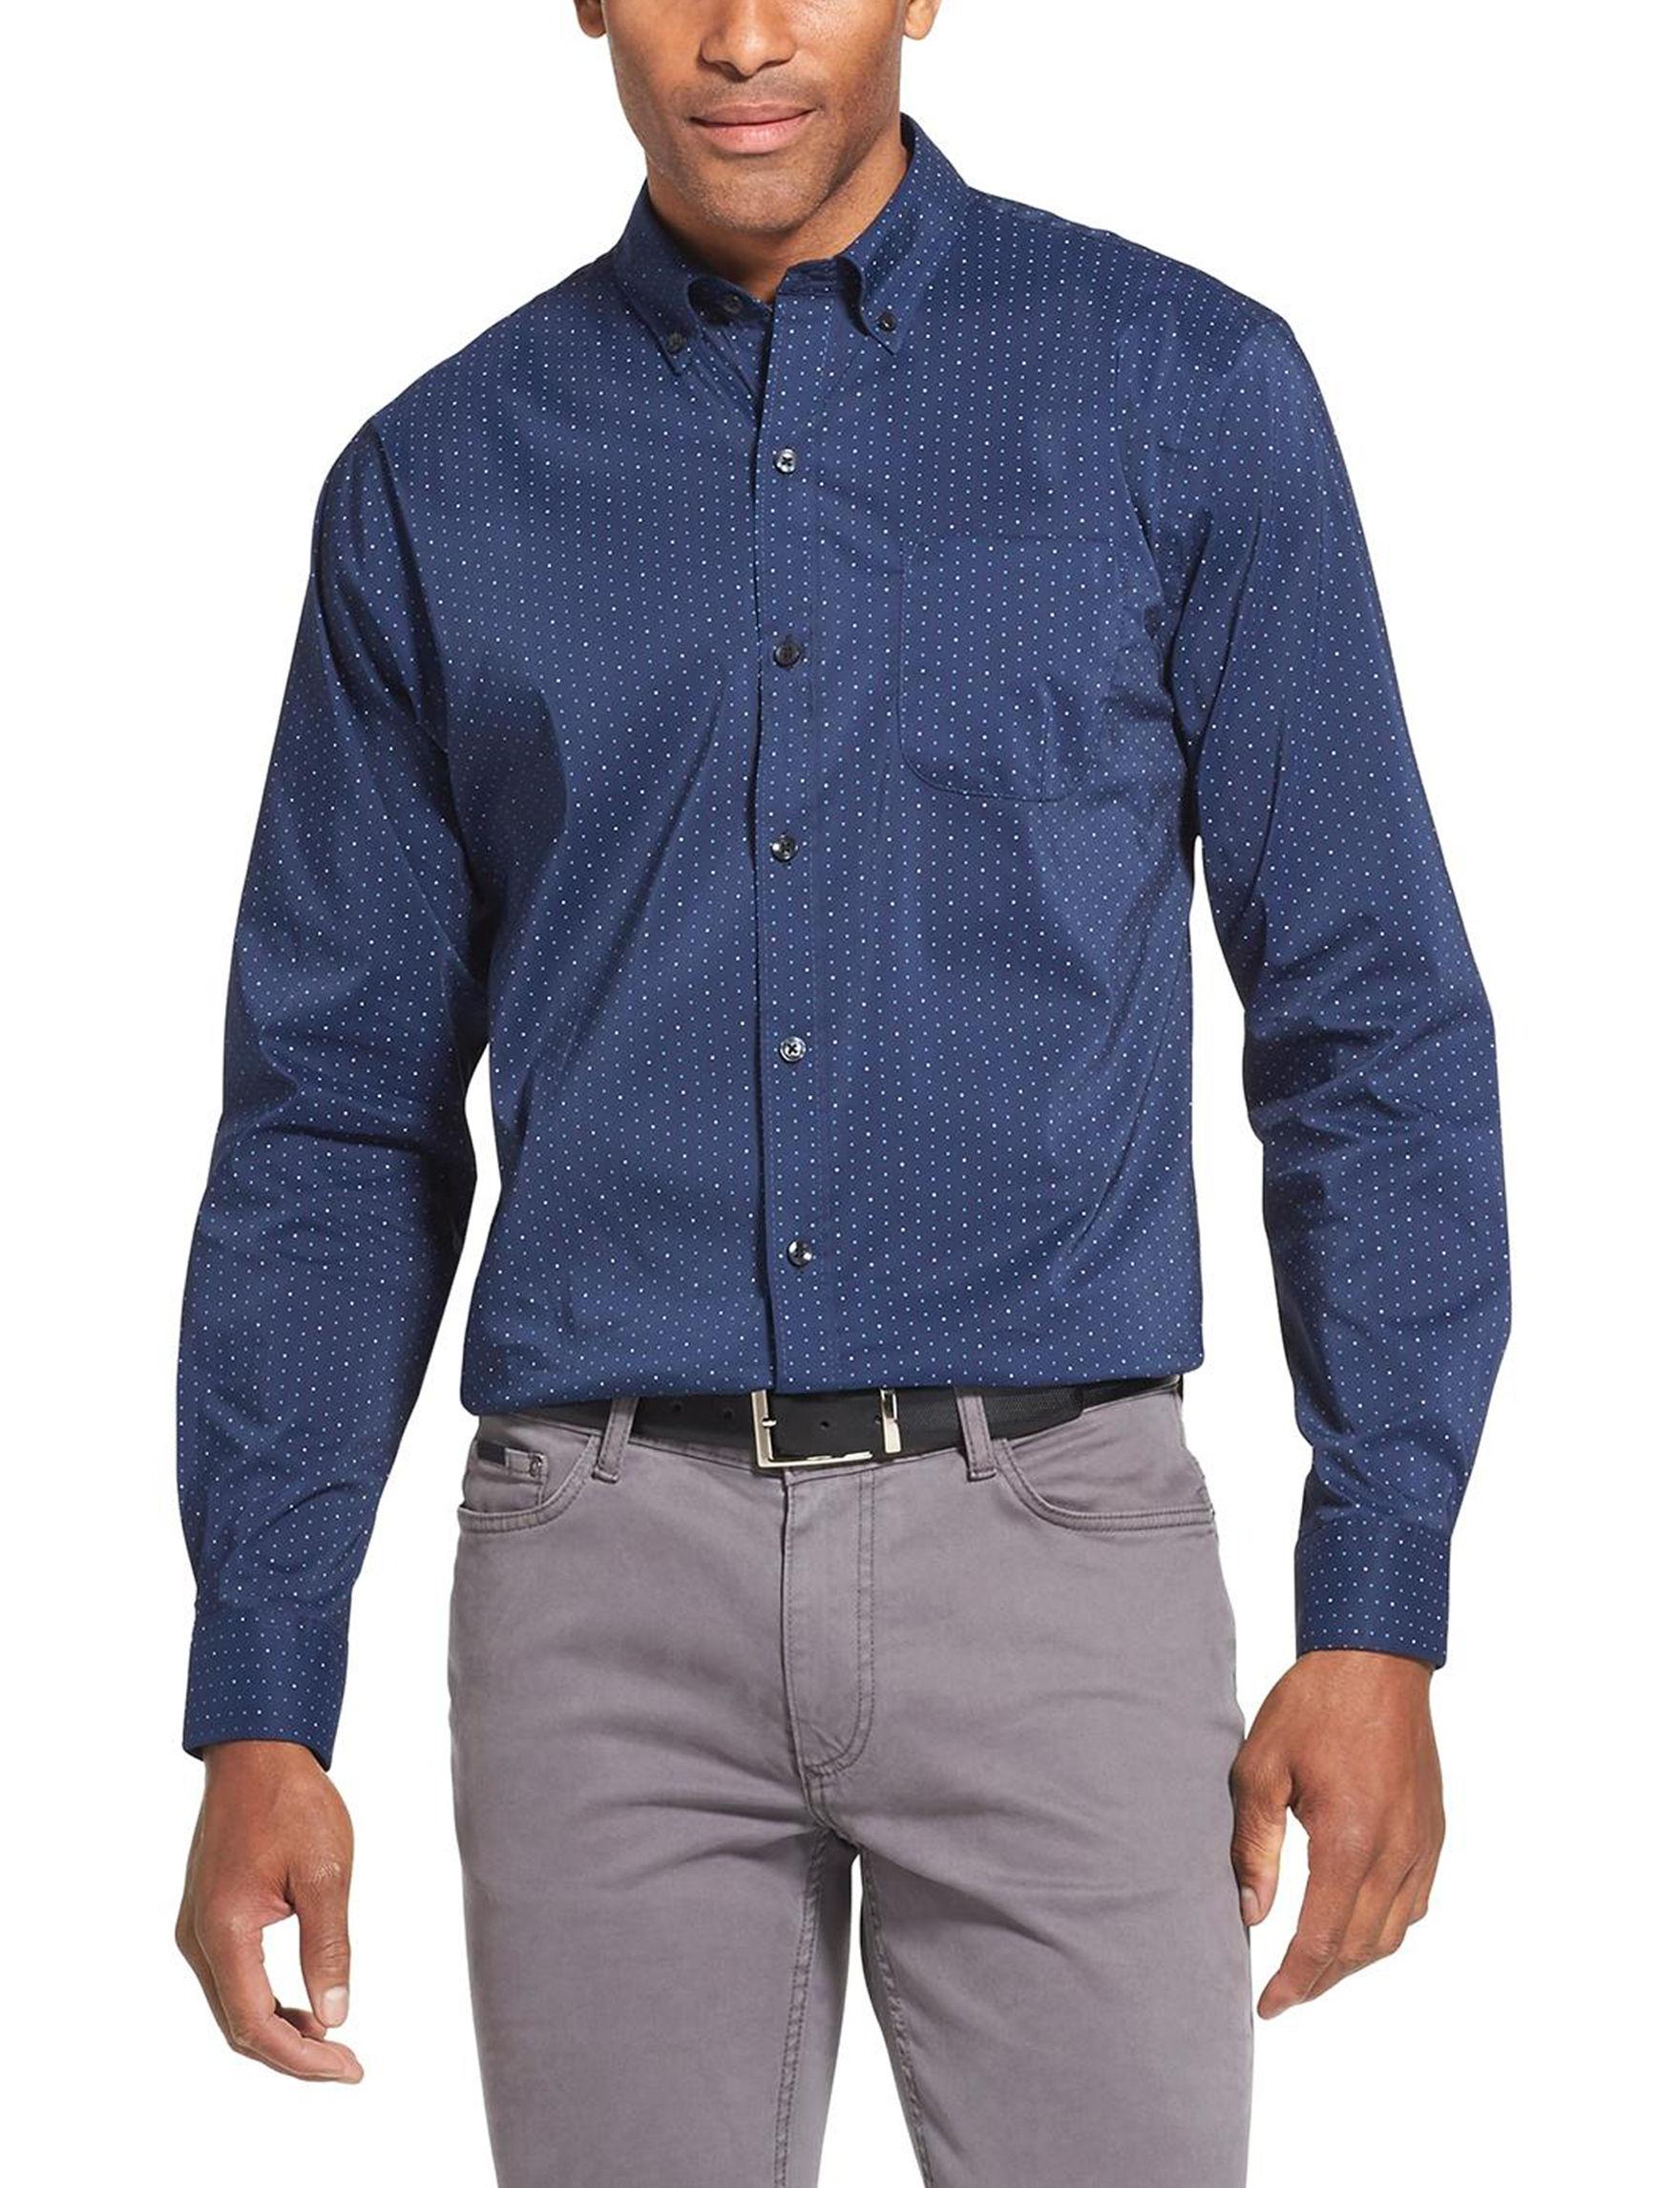 Van Heusen Navy Casual Button Down Shirts